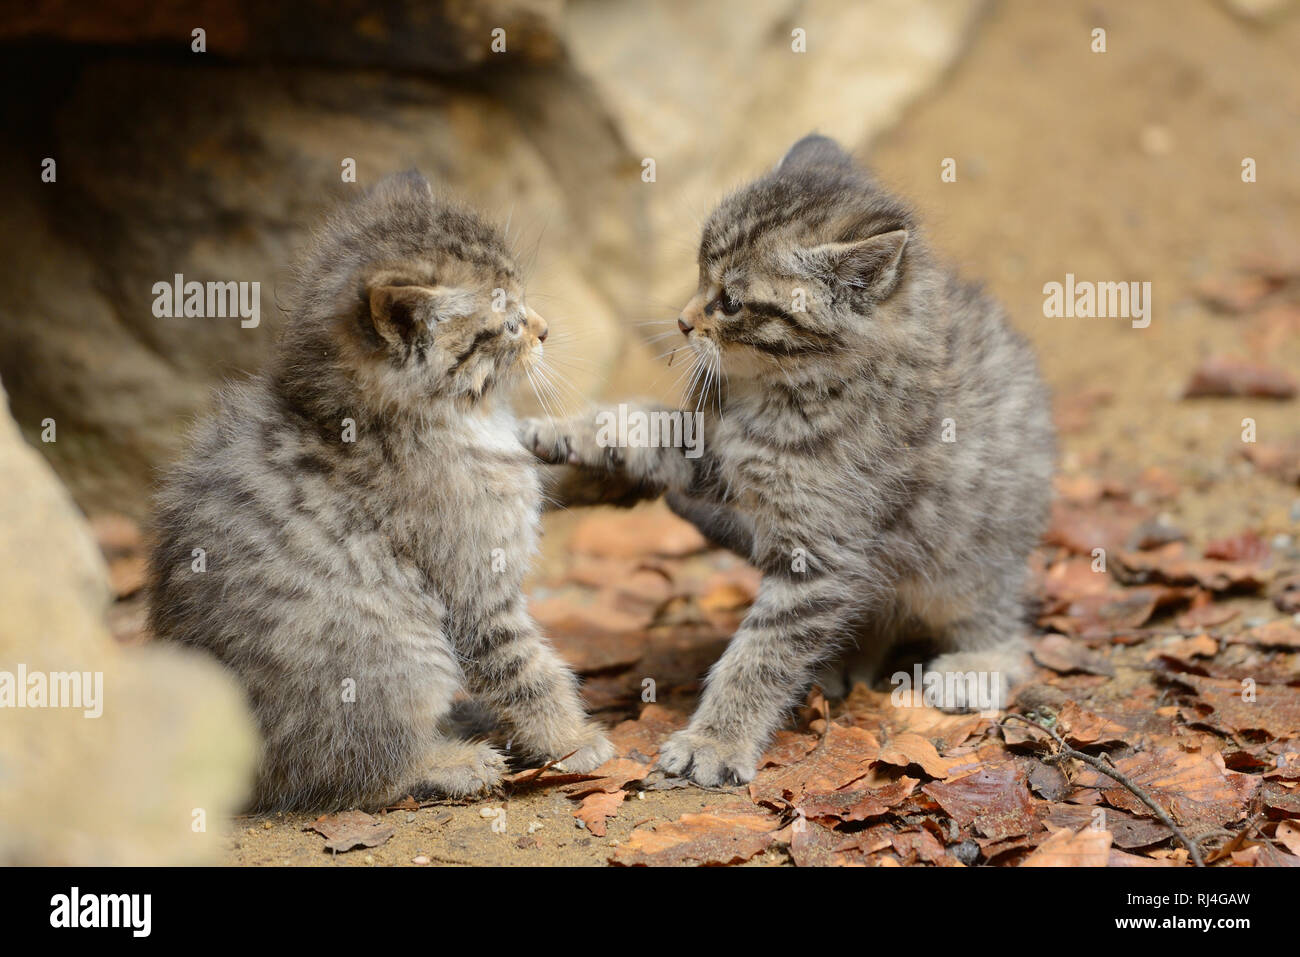 Europ?ische Wildkatzen, Felis silvestris silvestris, Jungtiere, spielen - Stock Image